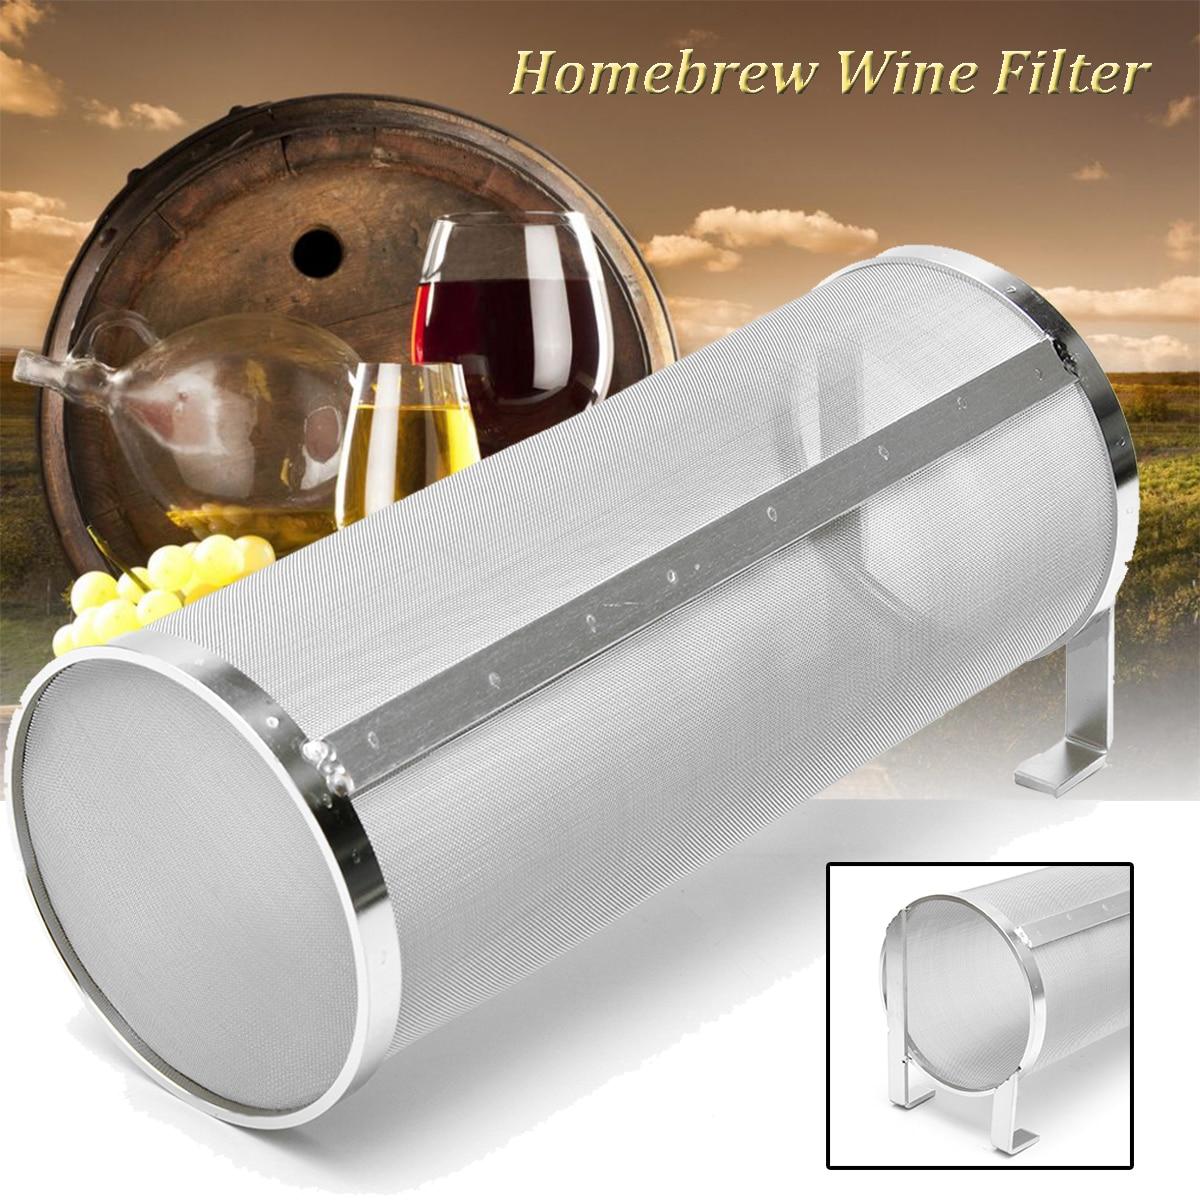 304 Stainless Steel Hop Spider Strainer Home brew Beer Pellet Hop Filter 100x255mm Reusable 400 Micron Filtering for Brew Kettle